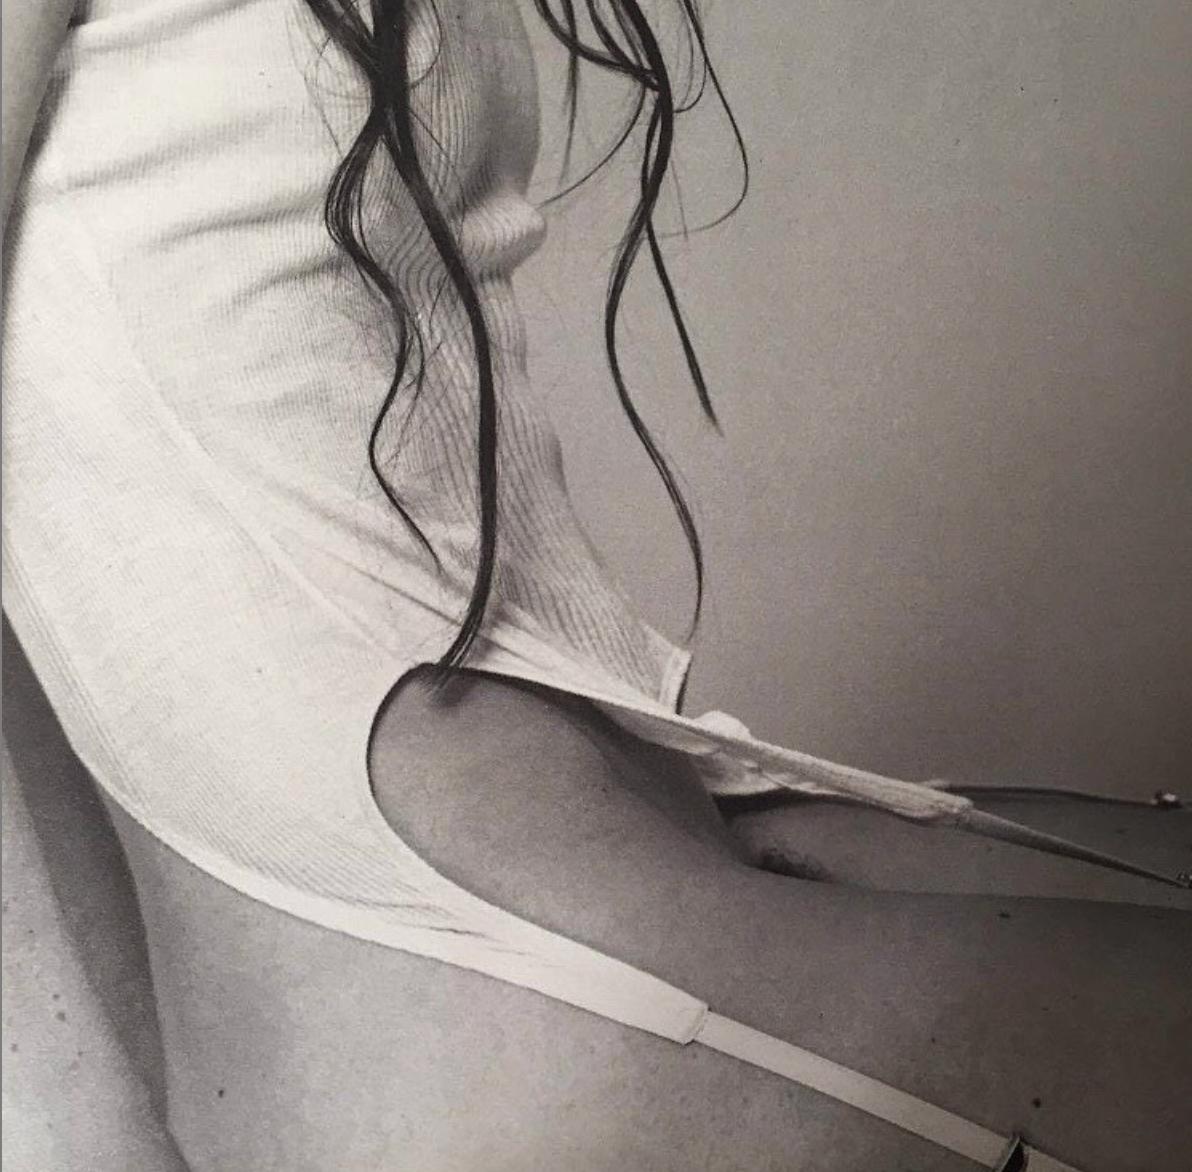 Benedicte from Modern Lovers series by Bettina Rheims